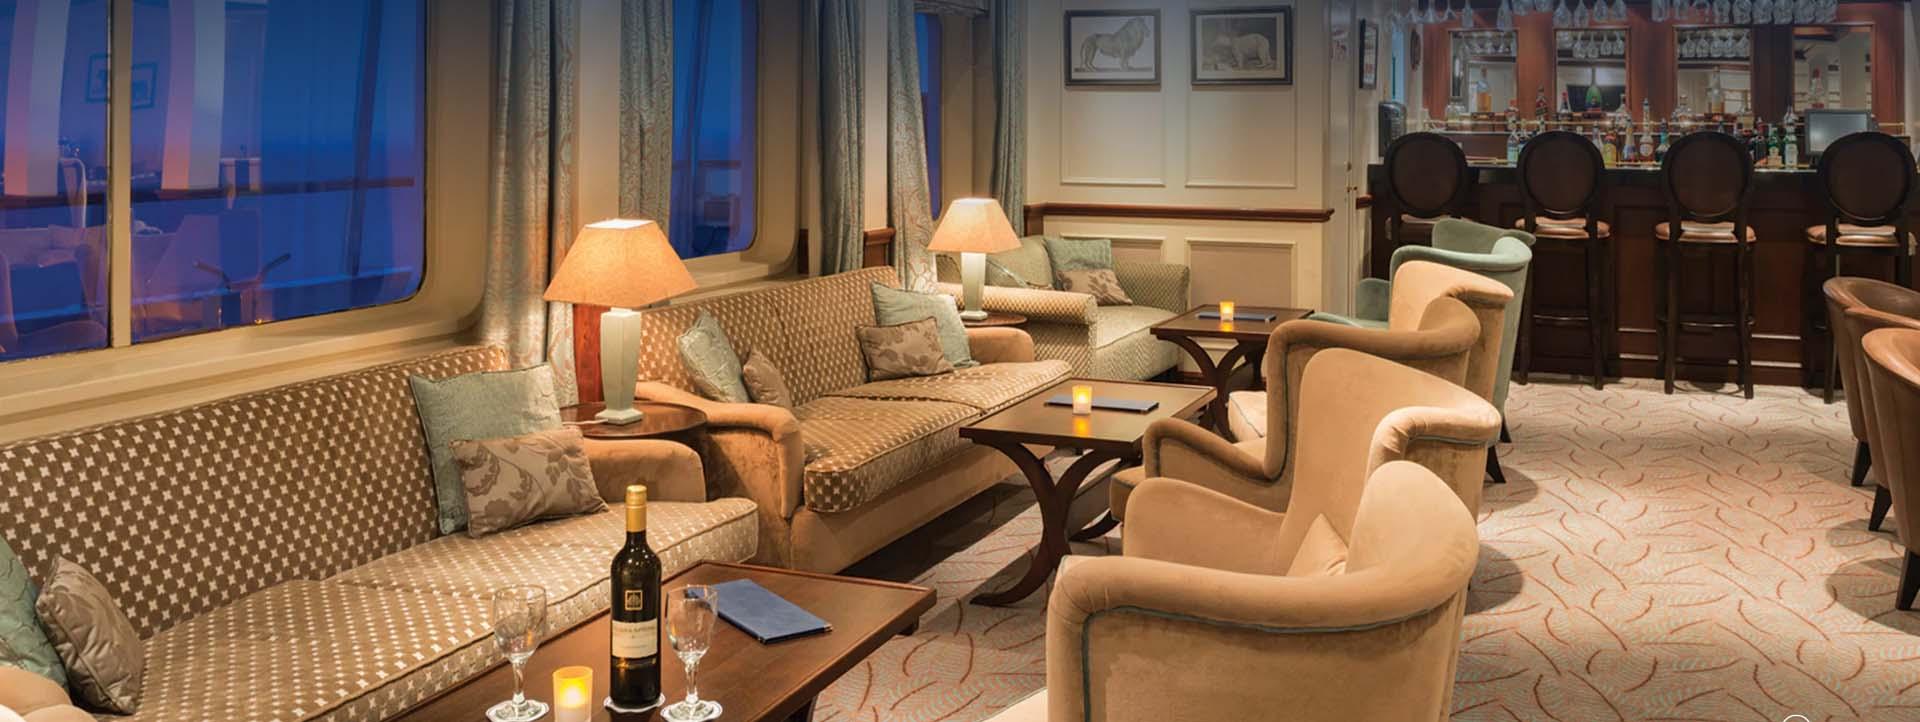 CALEDONIAN SKY bar and lounge